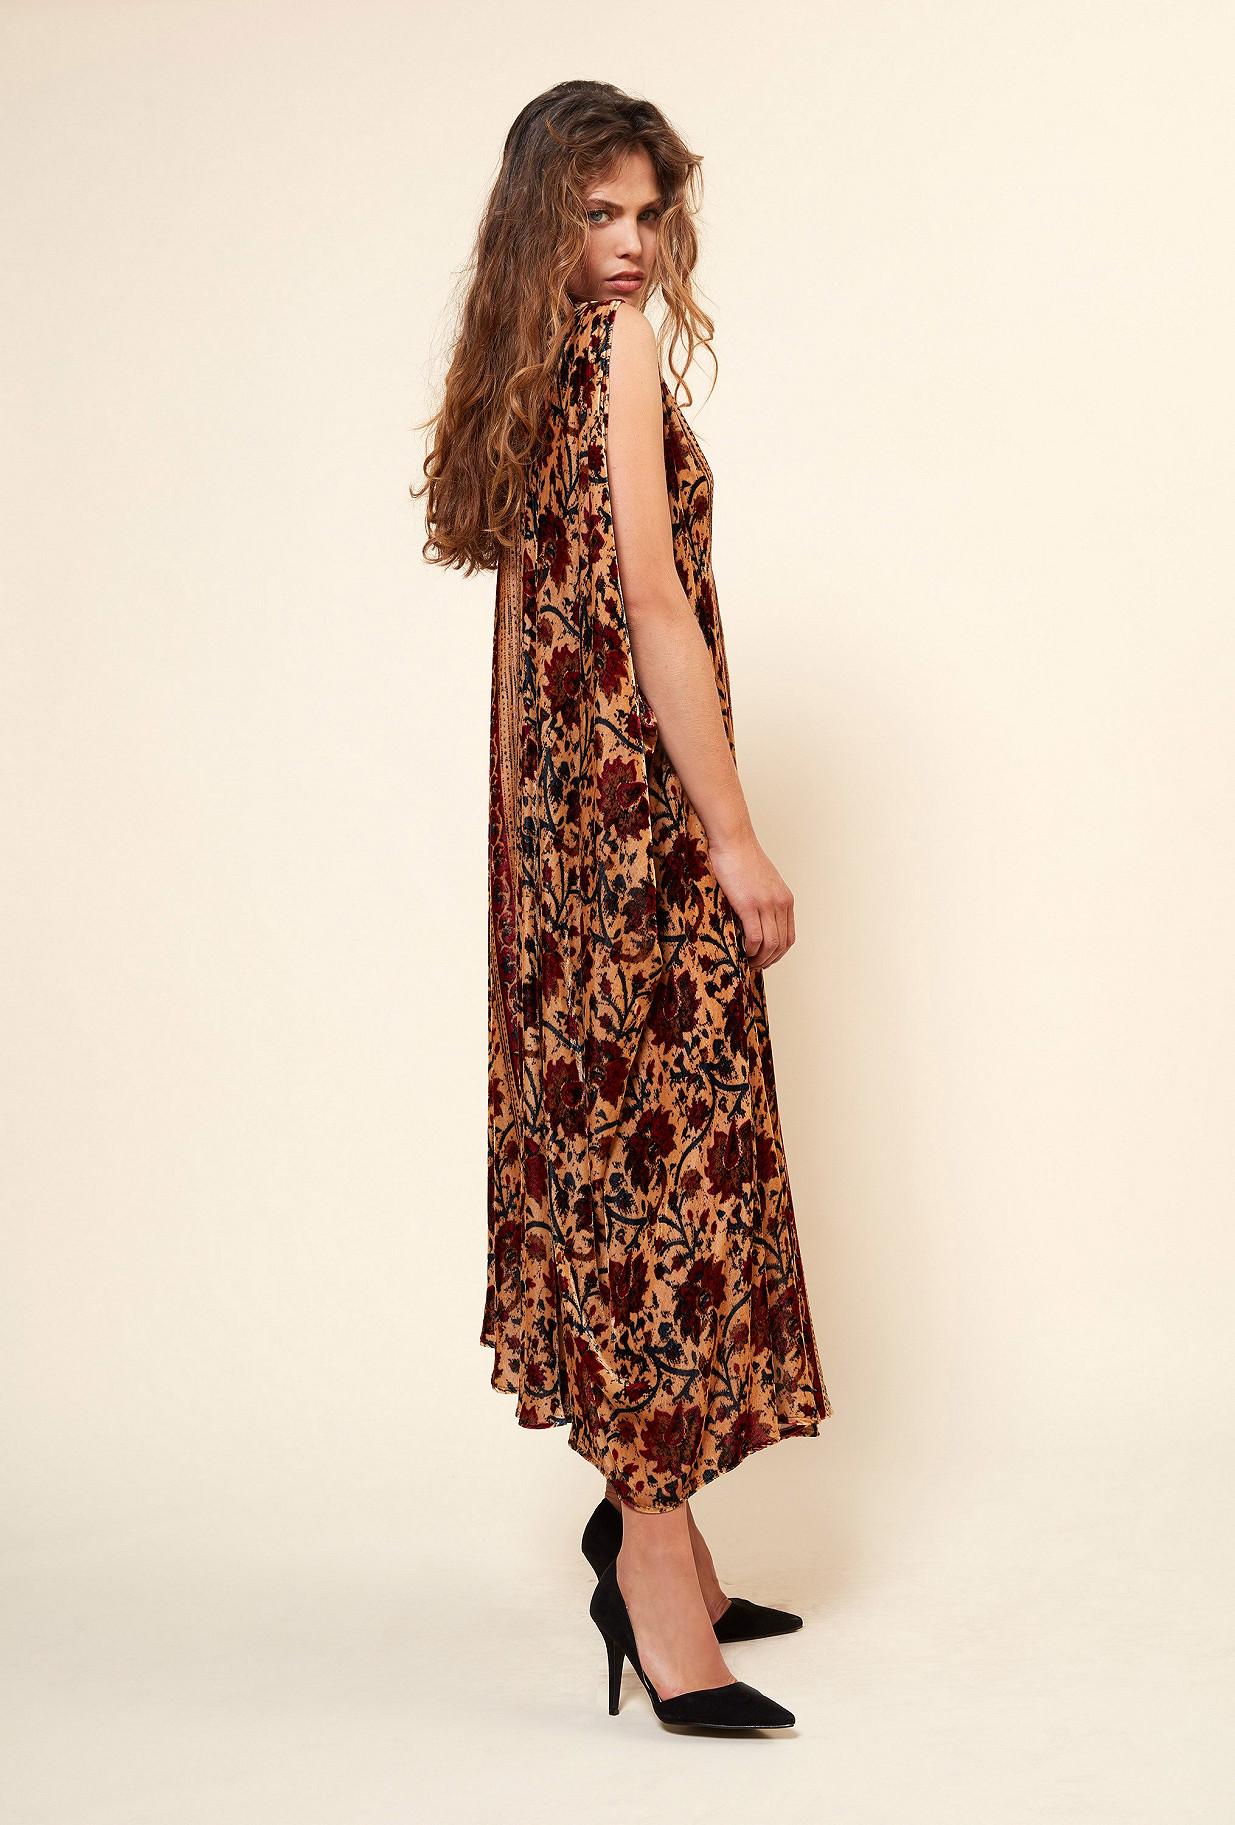 Robe Imprimé fleuri Chartreuse